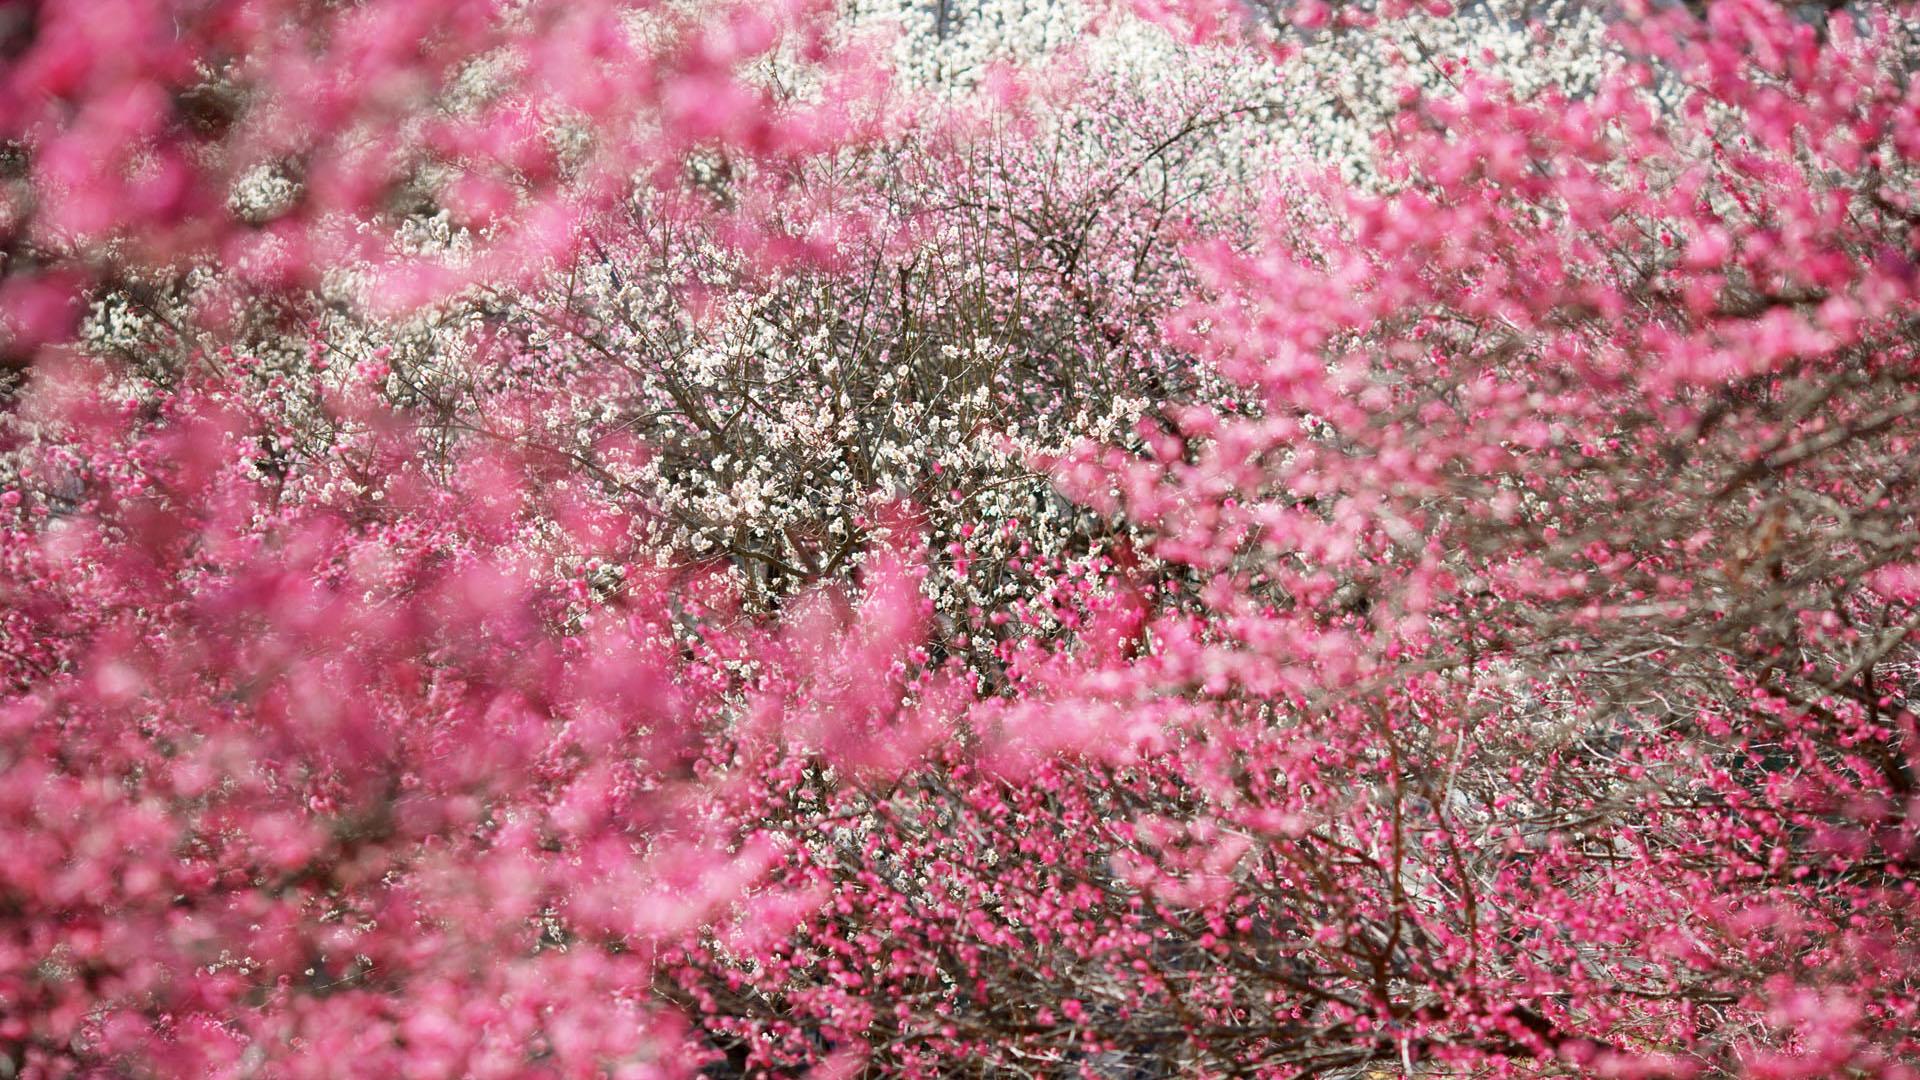 Flower Fall Wallpapers Hd Gmgpinkfallcoat1009935 Pink Autumn Scene